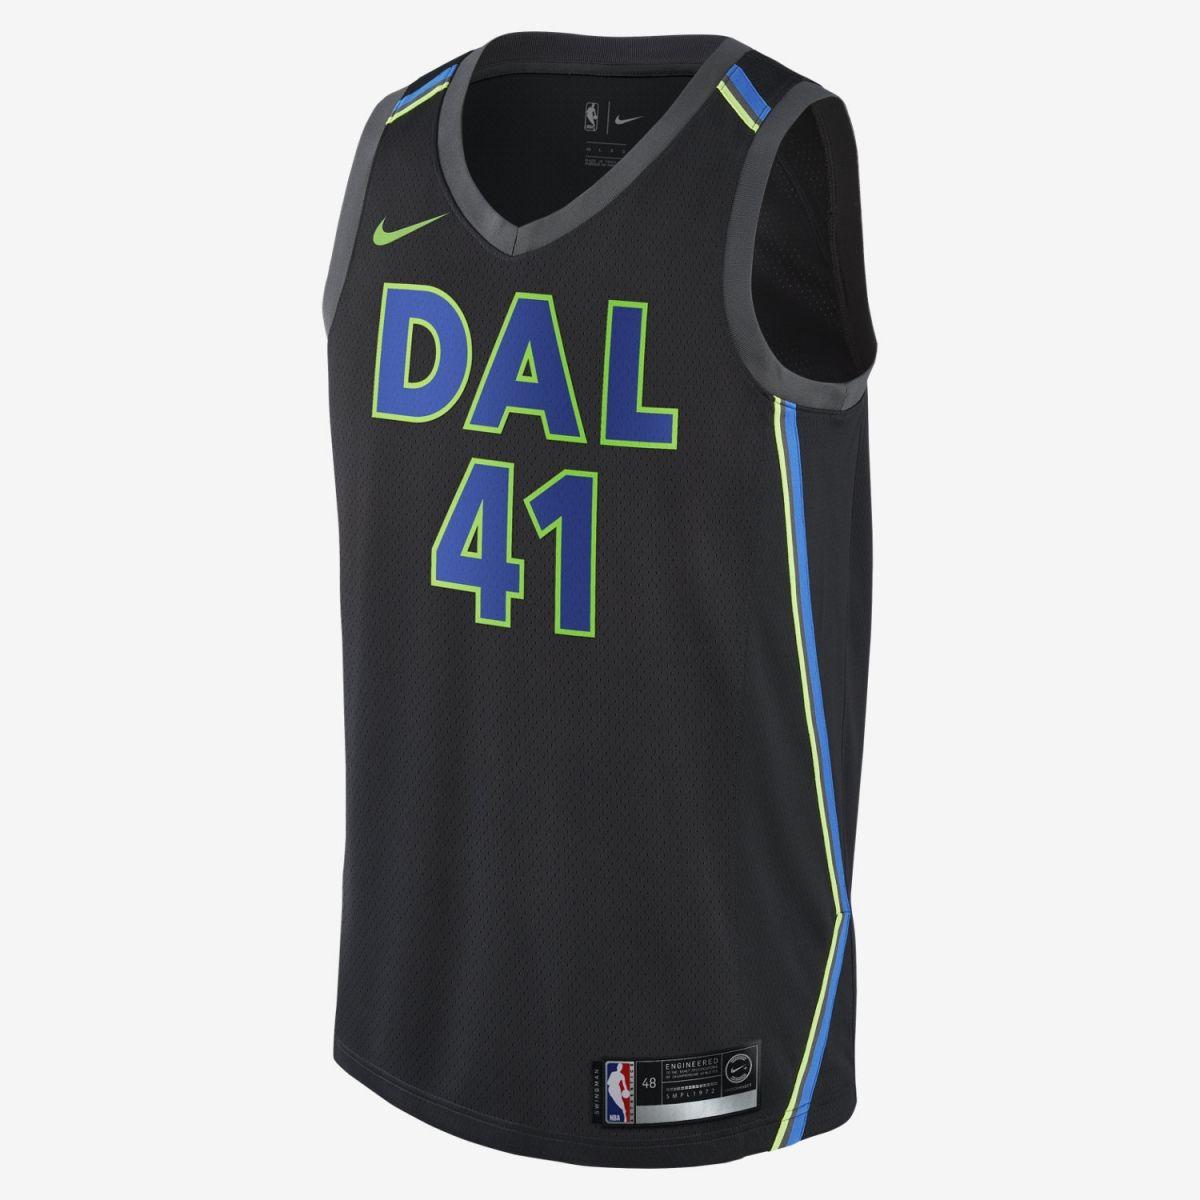 timeless design fbfa8 6c91f Type Shirts Nike NBA Dallas Mavericks Dirk Nowitzki City Edition Swingman  Jersey